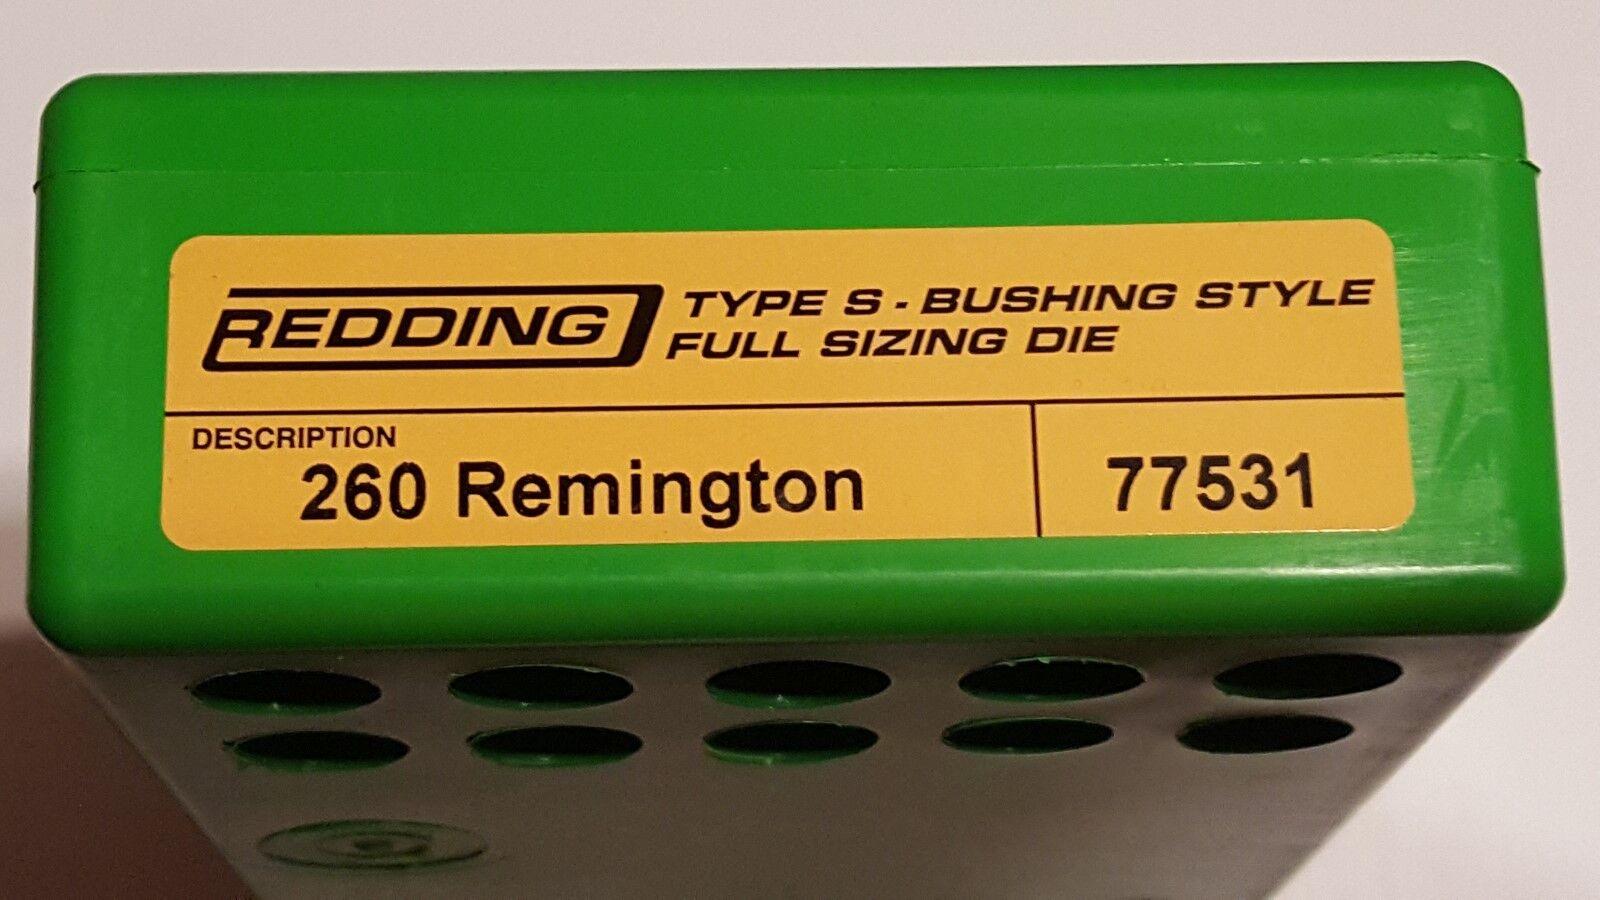 77531 rojoDING Tipo S Buje De Longitud Completa De Tamaño Die - 260 REMINGTON-totalmente Nuevo